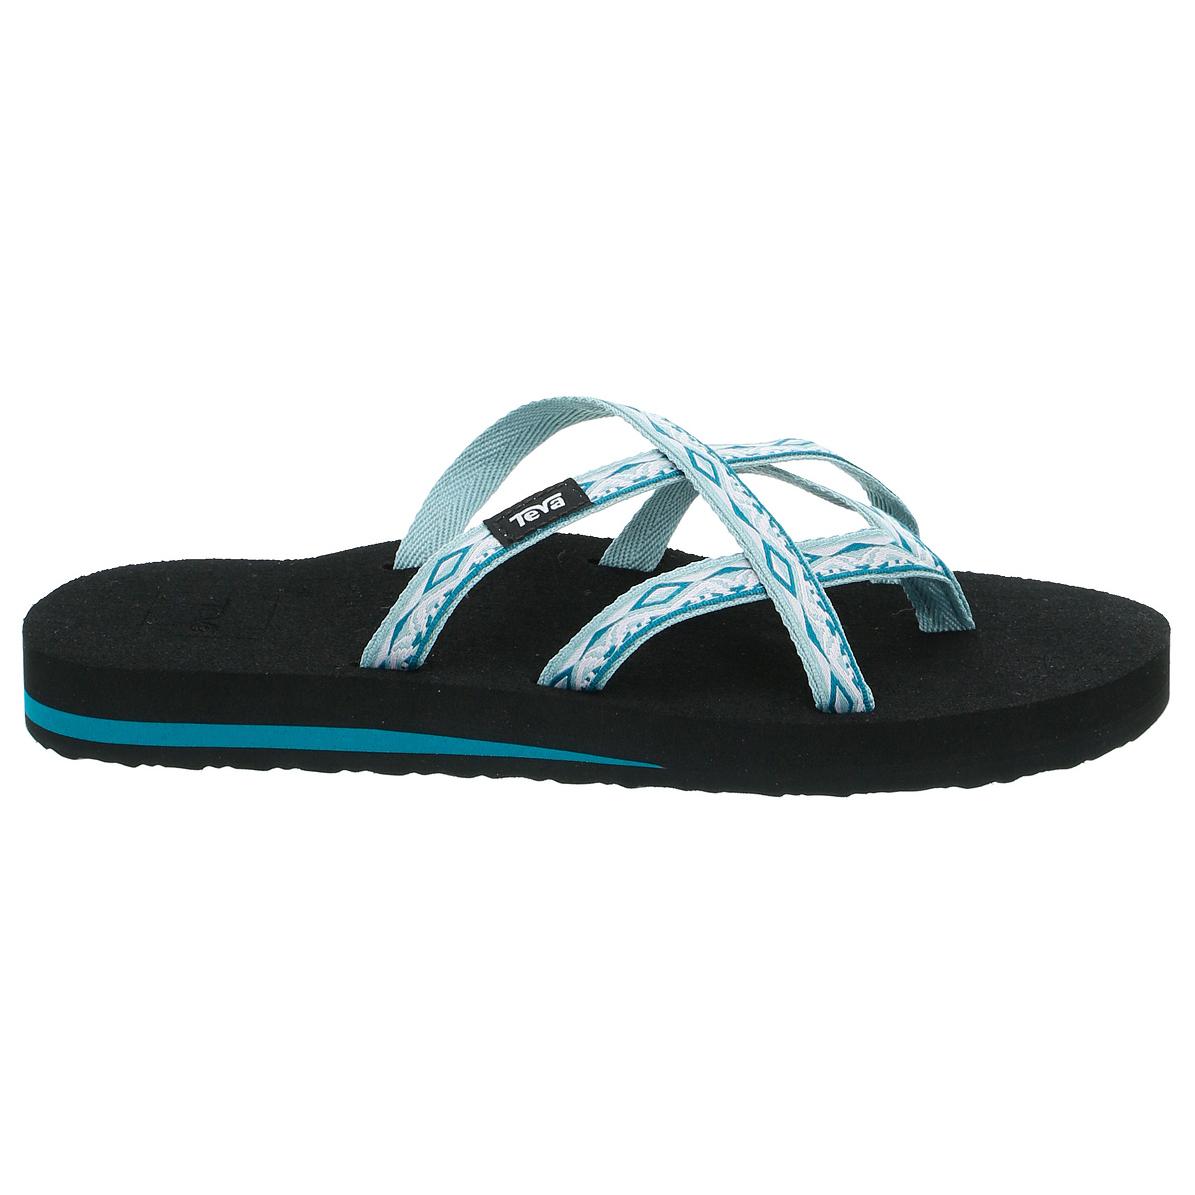 2346145cc008c Teva - Women's Olowahu - Sandals - Himalaya Lapis Blue | 11 (US)